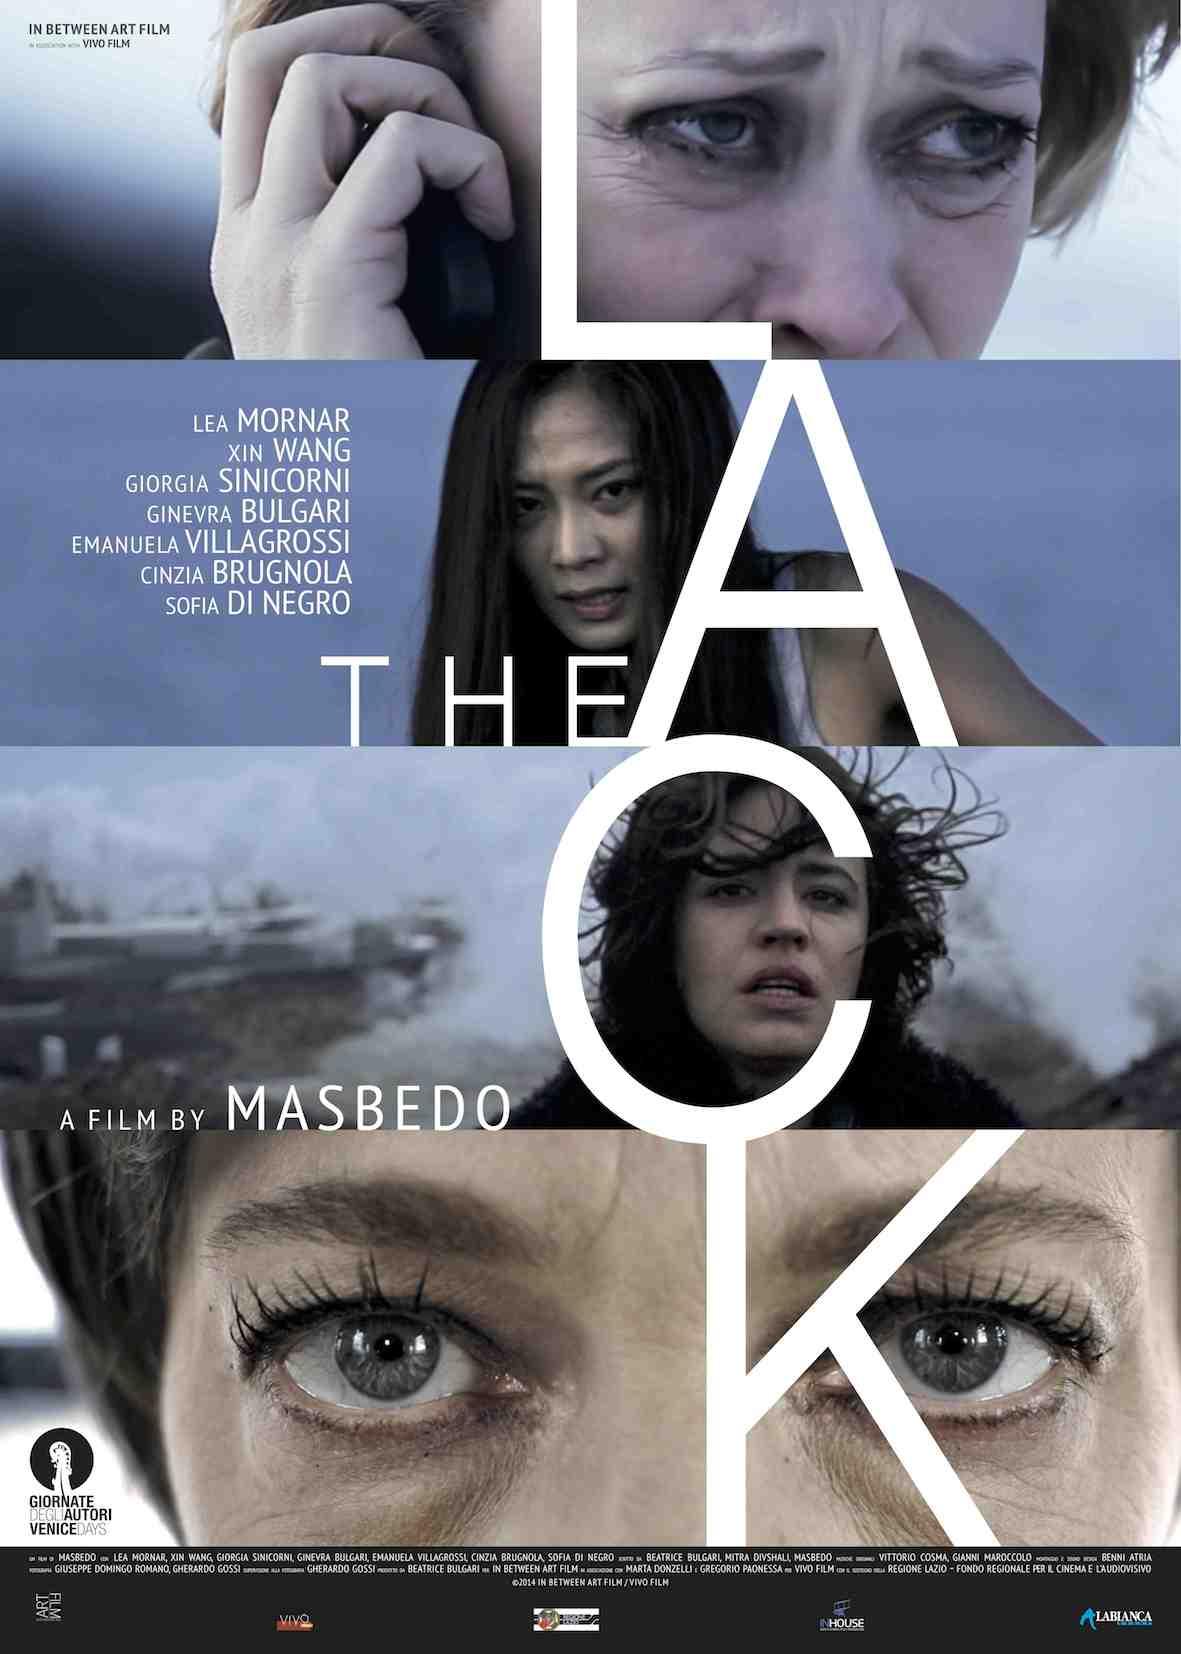 A_MASBEDO_THE_LACK-LOCANDINA-MAMBO